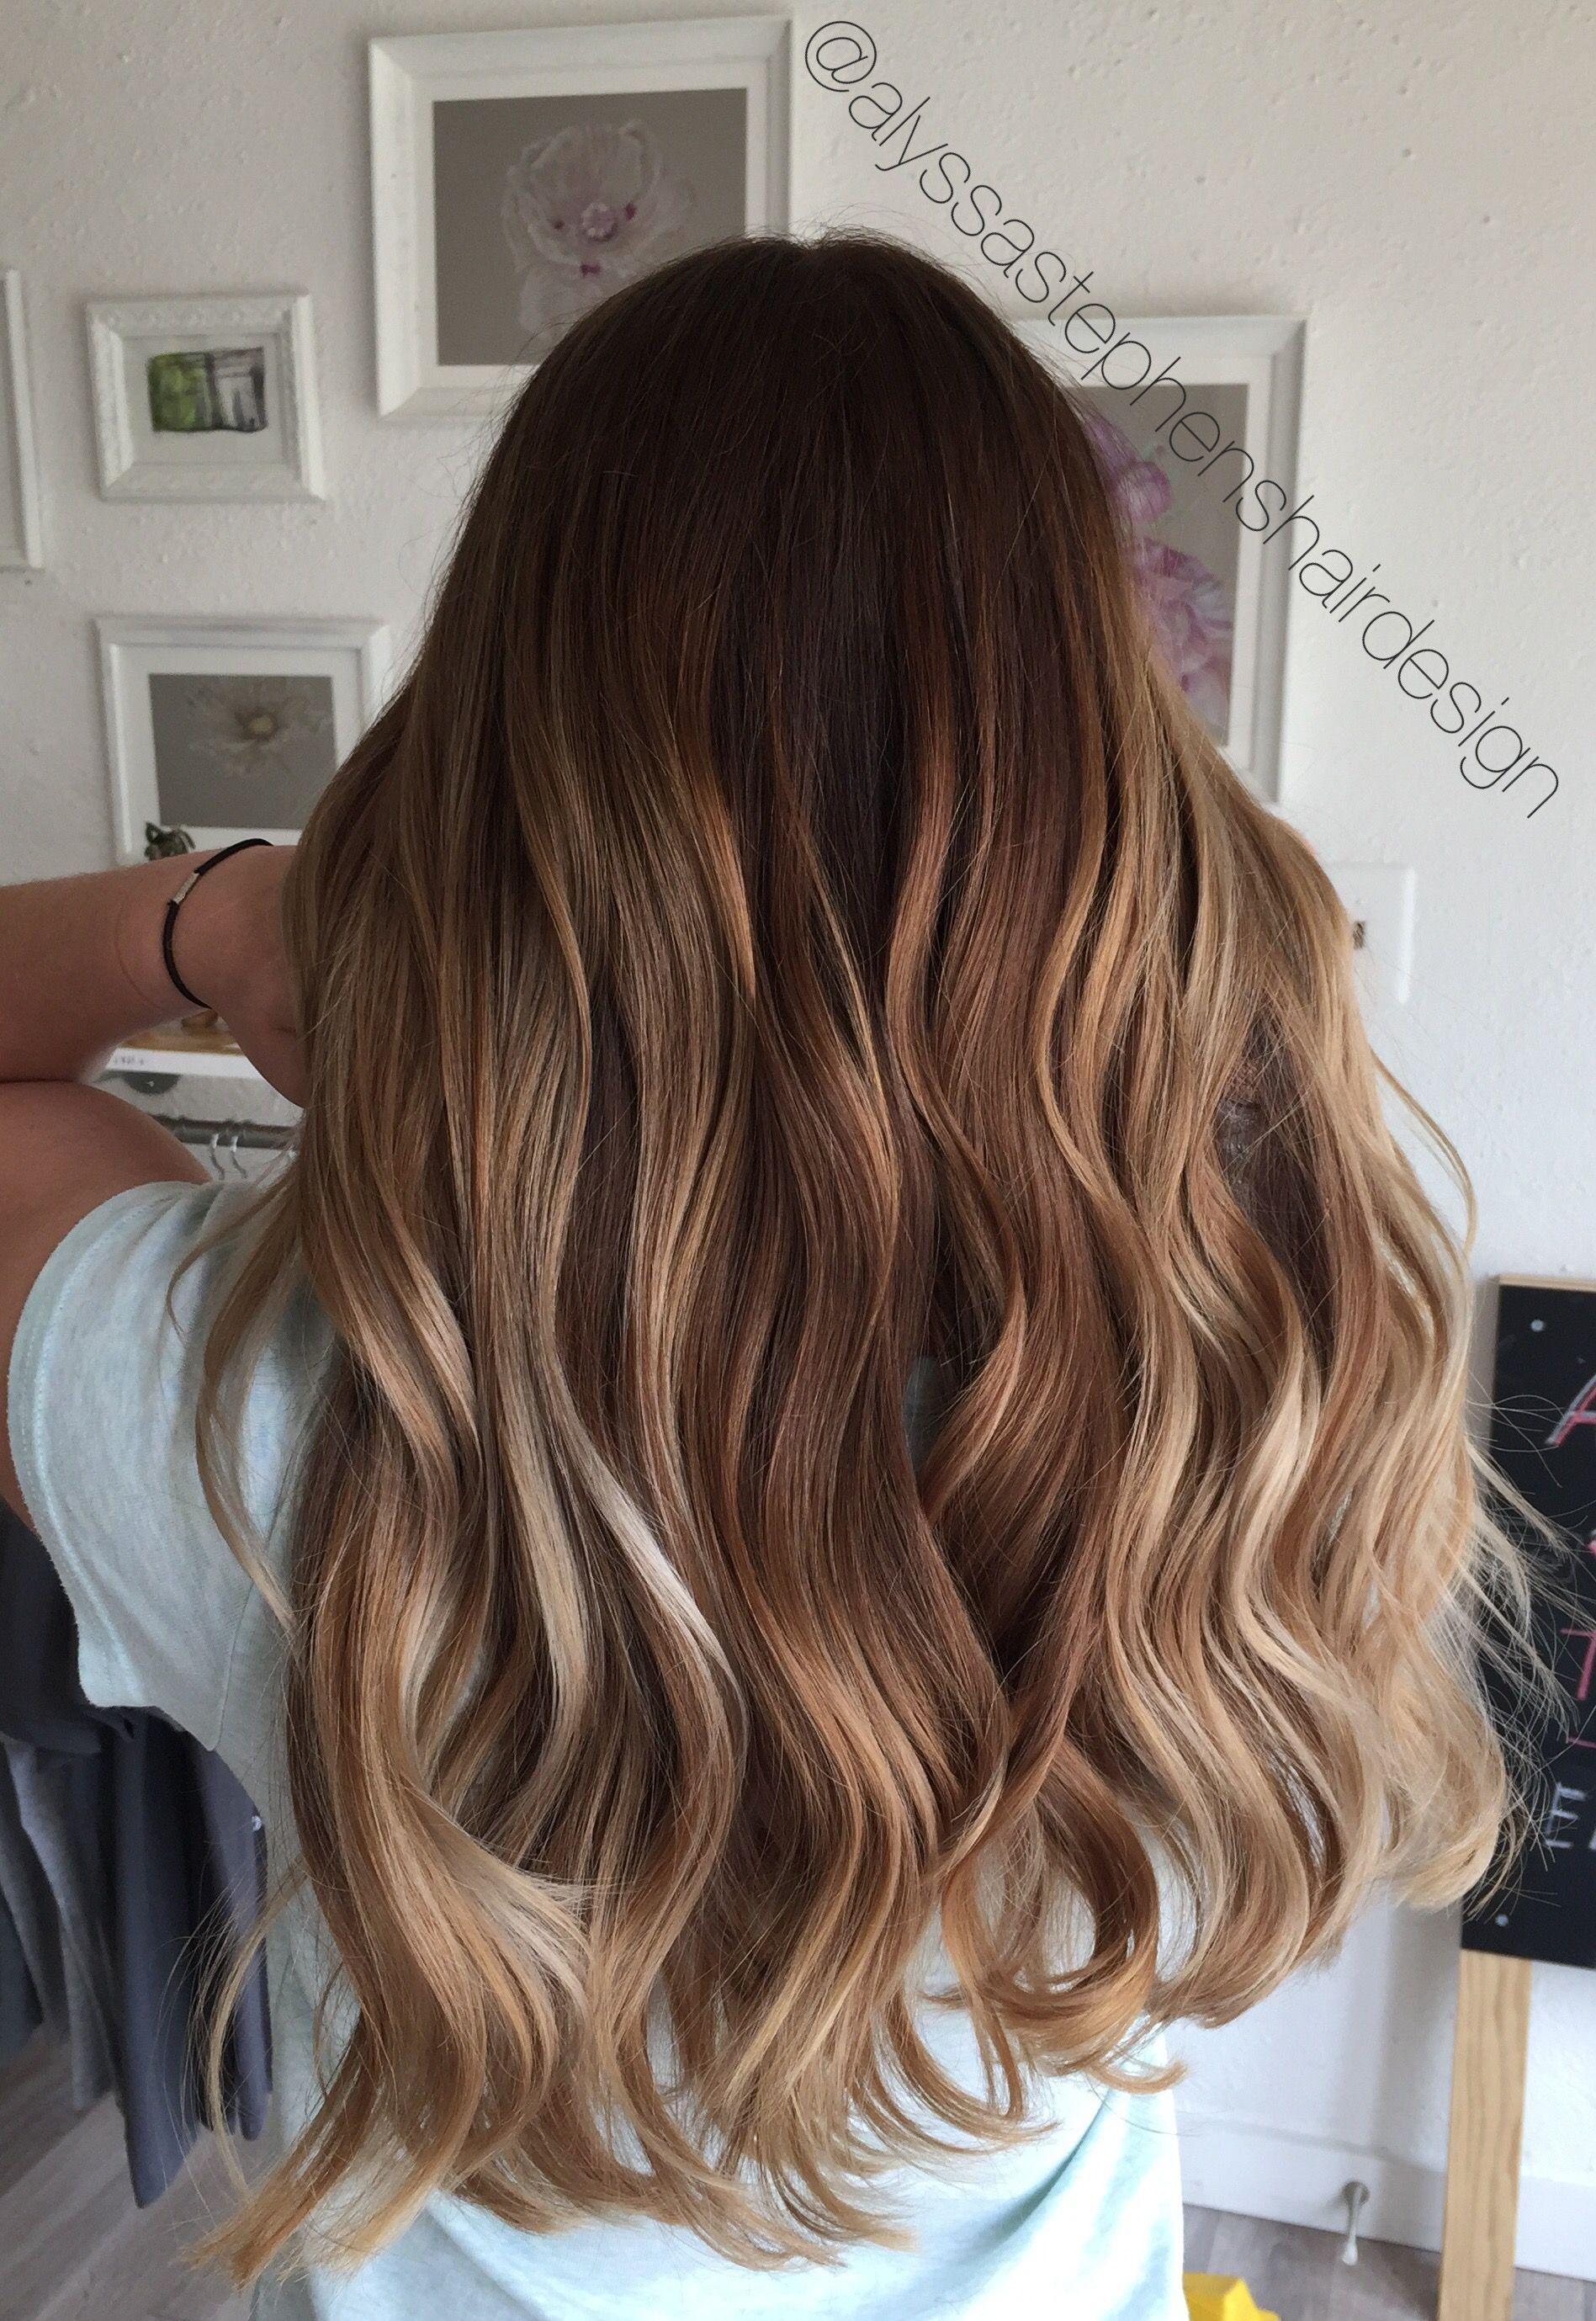 Milk Chocolate Honey Blonde Bronde Balayage Hair Color Alyssa